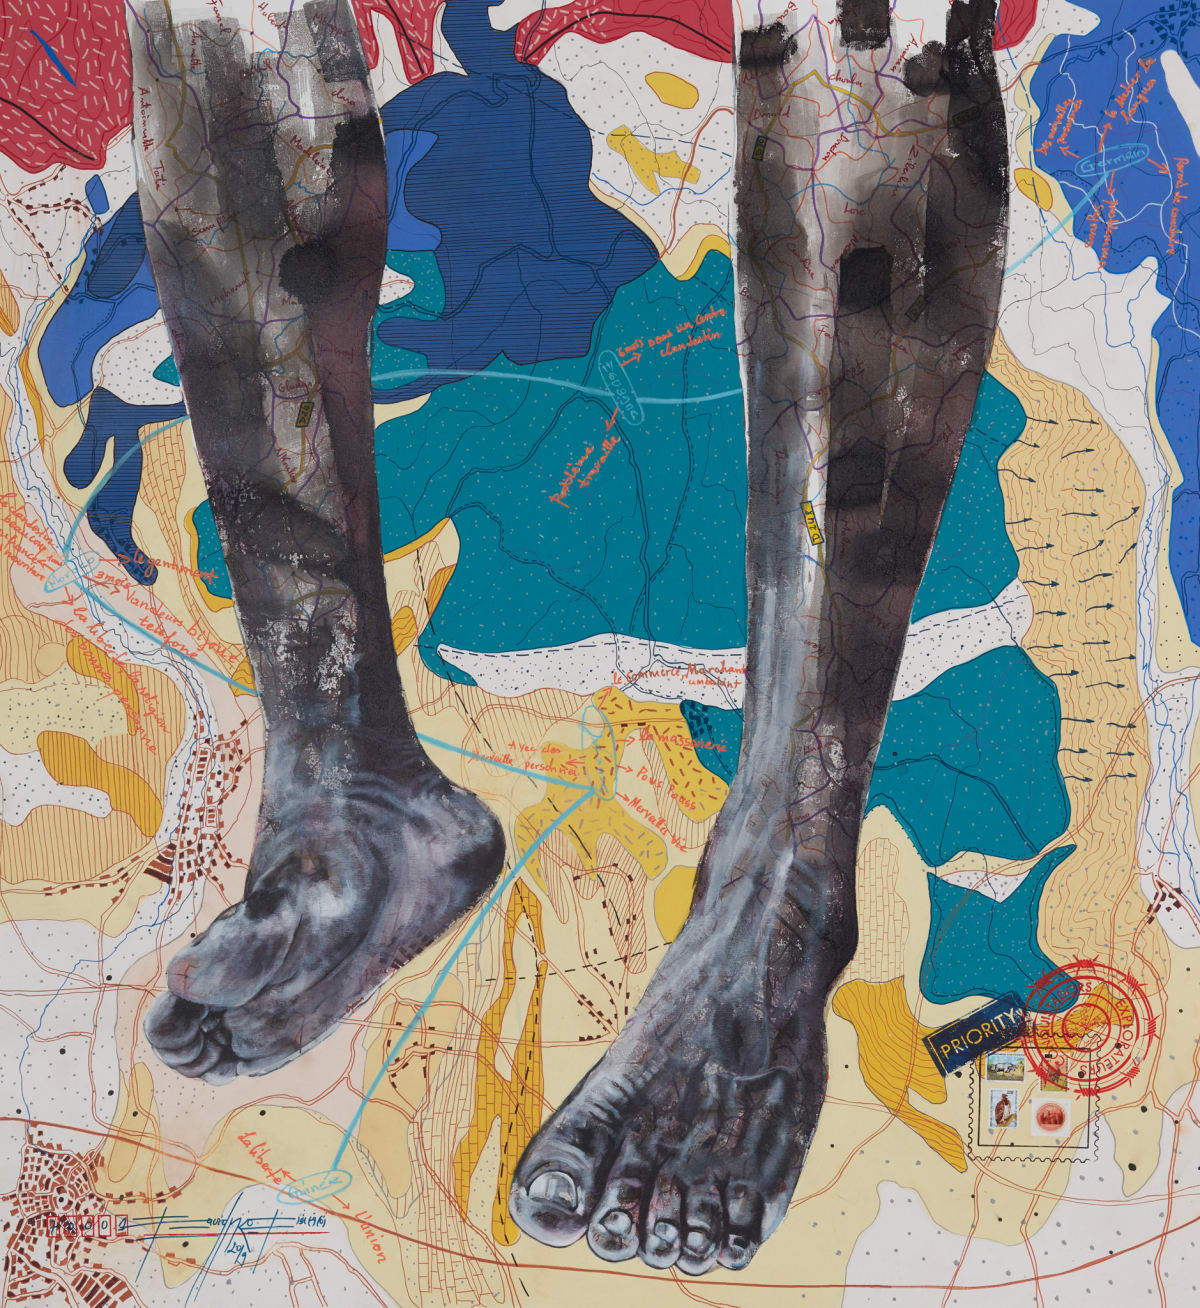 Jean David Nkot, www. the feet story. org, 2019